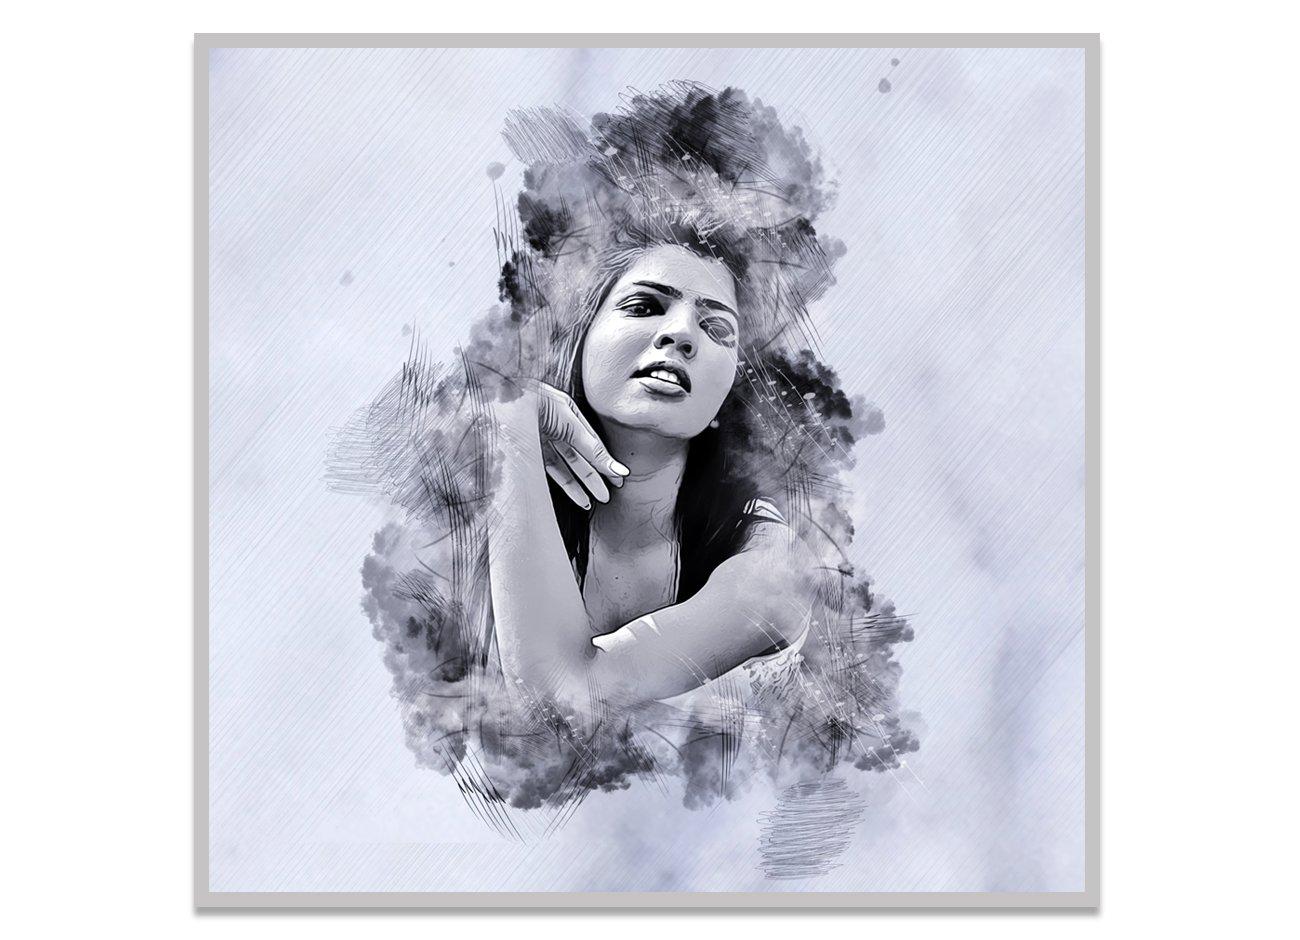 水墨素描效果照片处理特效PS动作模板 Ink Sketch Art Photoshop Action插图9